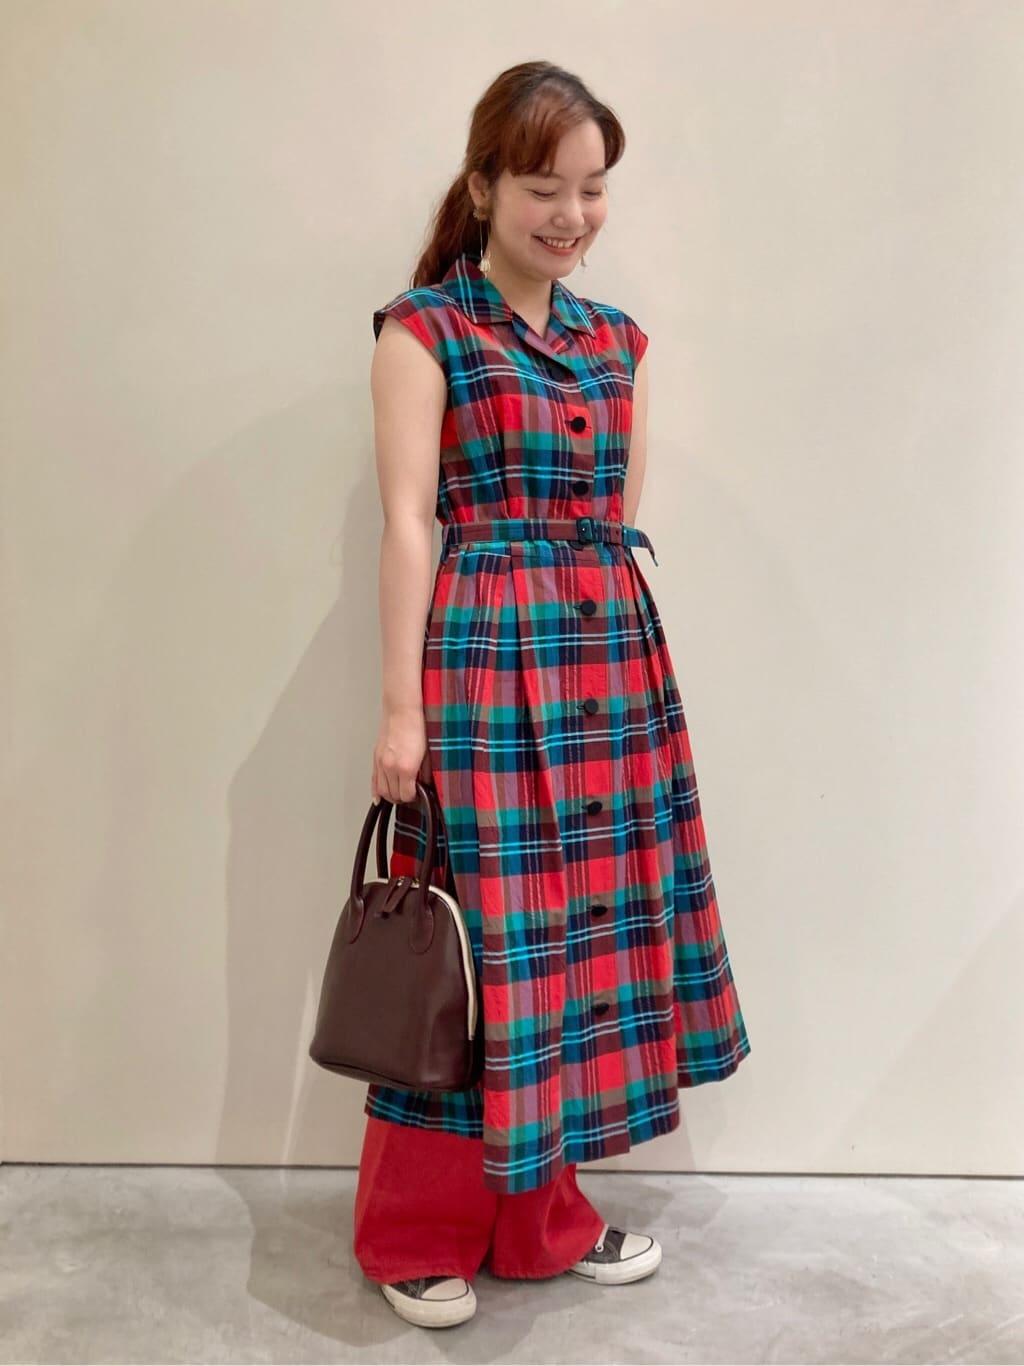 Dot and Stripes CHILD WOMAN CHILD WOMAN , PAR ICI 新宿ミロード 身長:160cm 2021.08.12